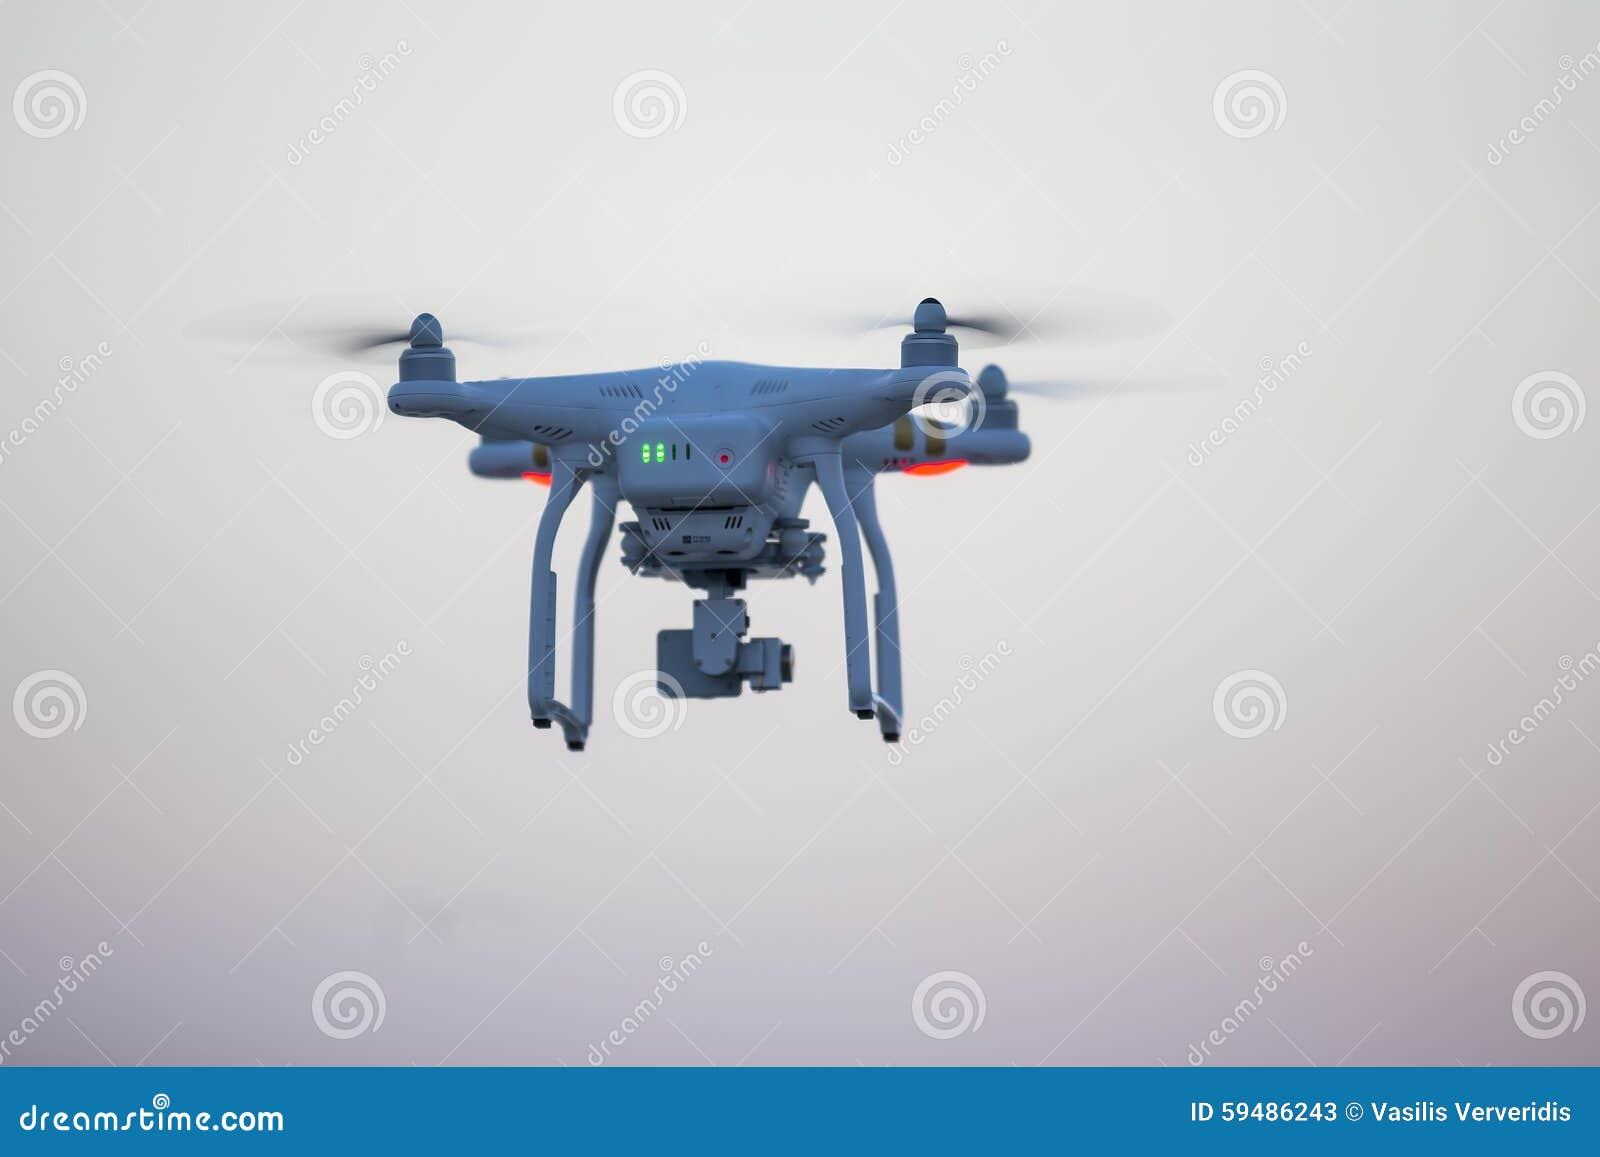 drone quadrocopter dji phantom 3 professional with high resoluti